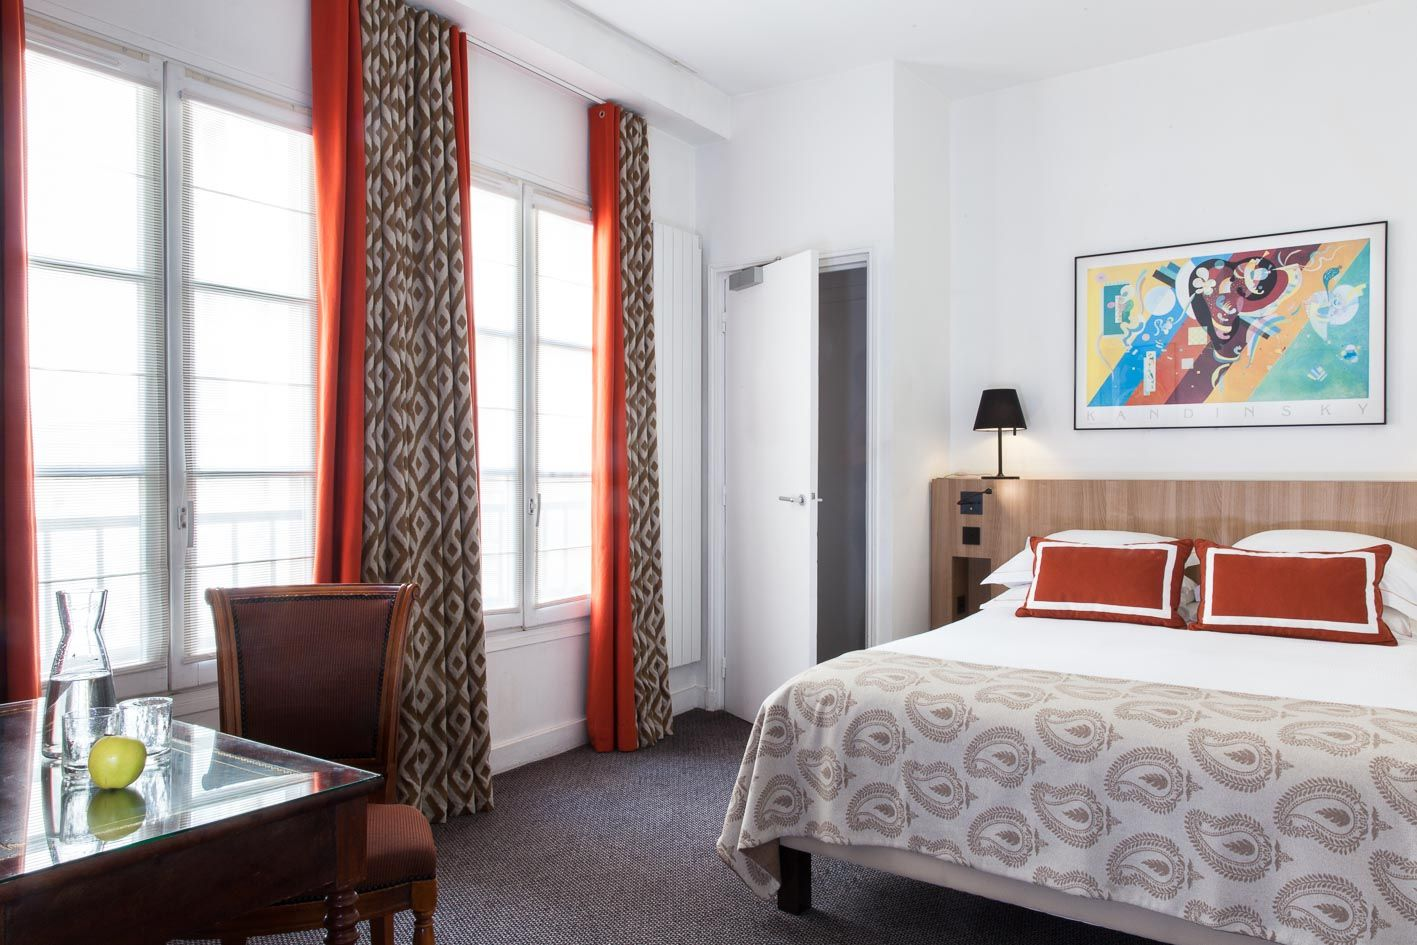 The Rooms That Welcome You At The Hotel Brighton Hotel De La Place Du Louvre Paris Hotel Place Brighton Hotels Louvre Paris